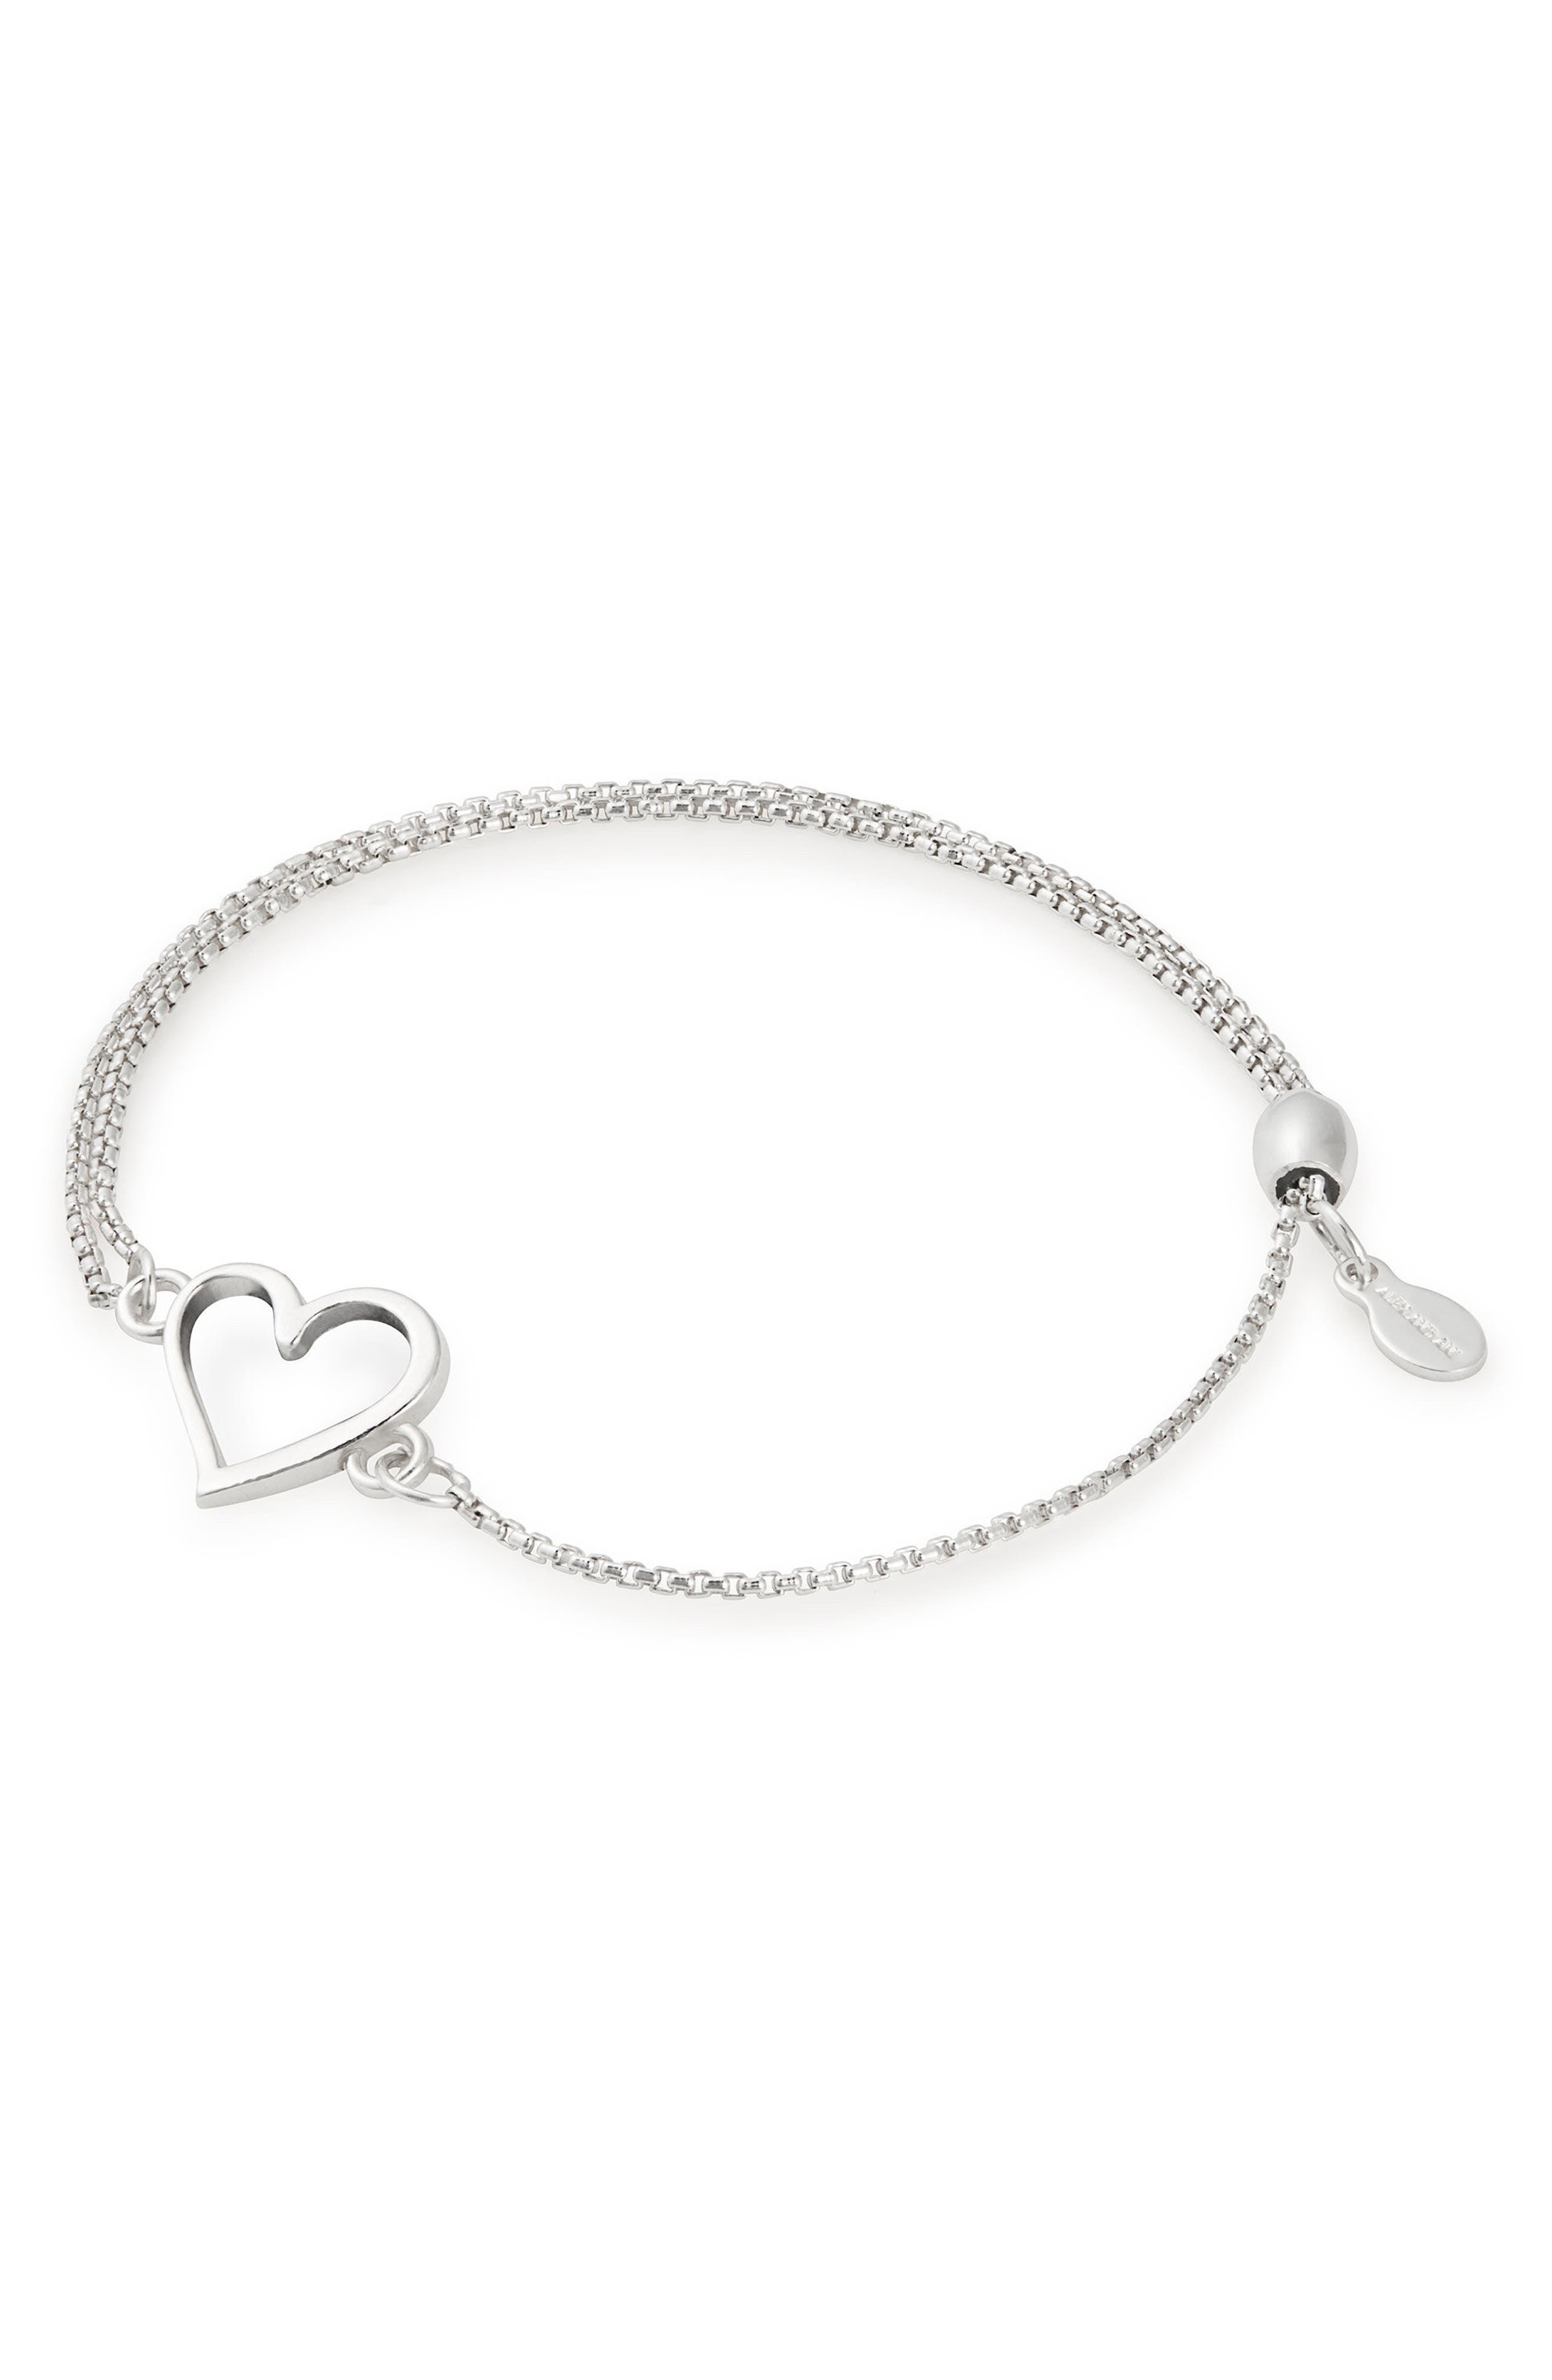 Heart Pull Chain Bracelet,                             Main thumbnail 1, color,                             SILVER